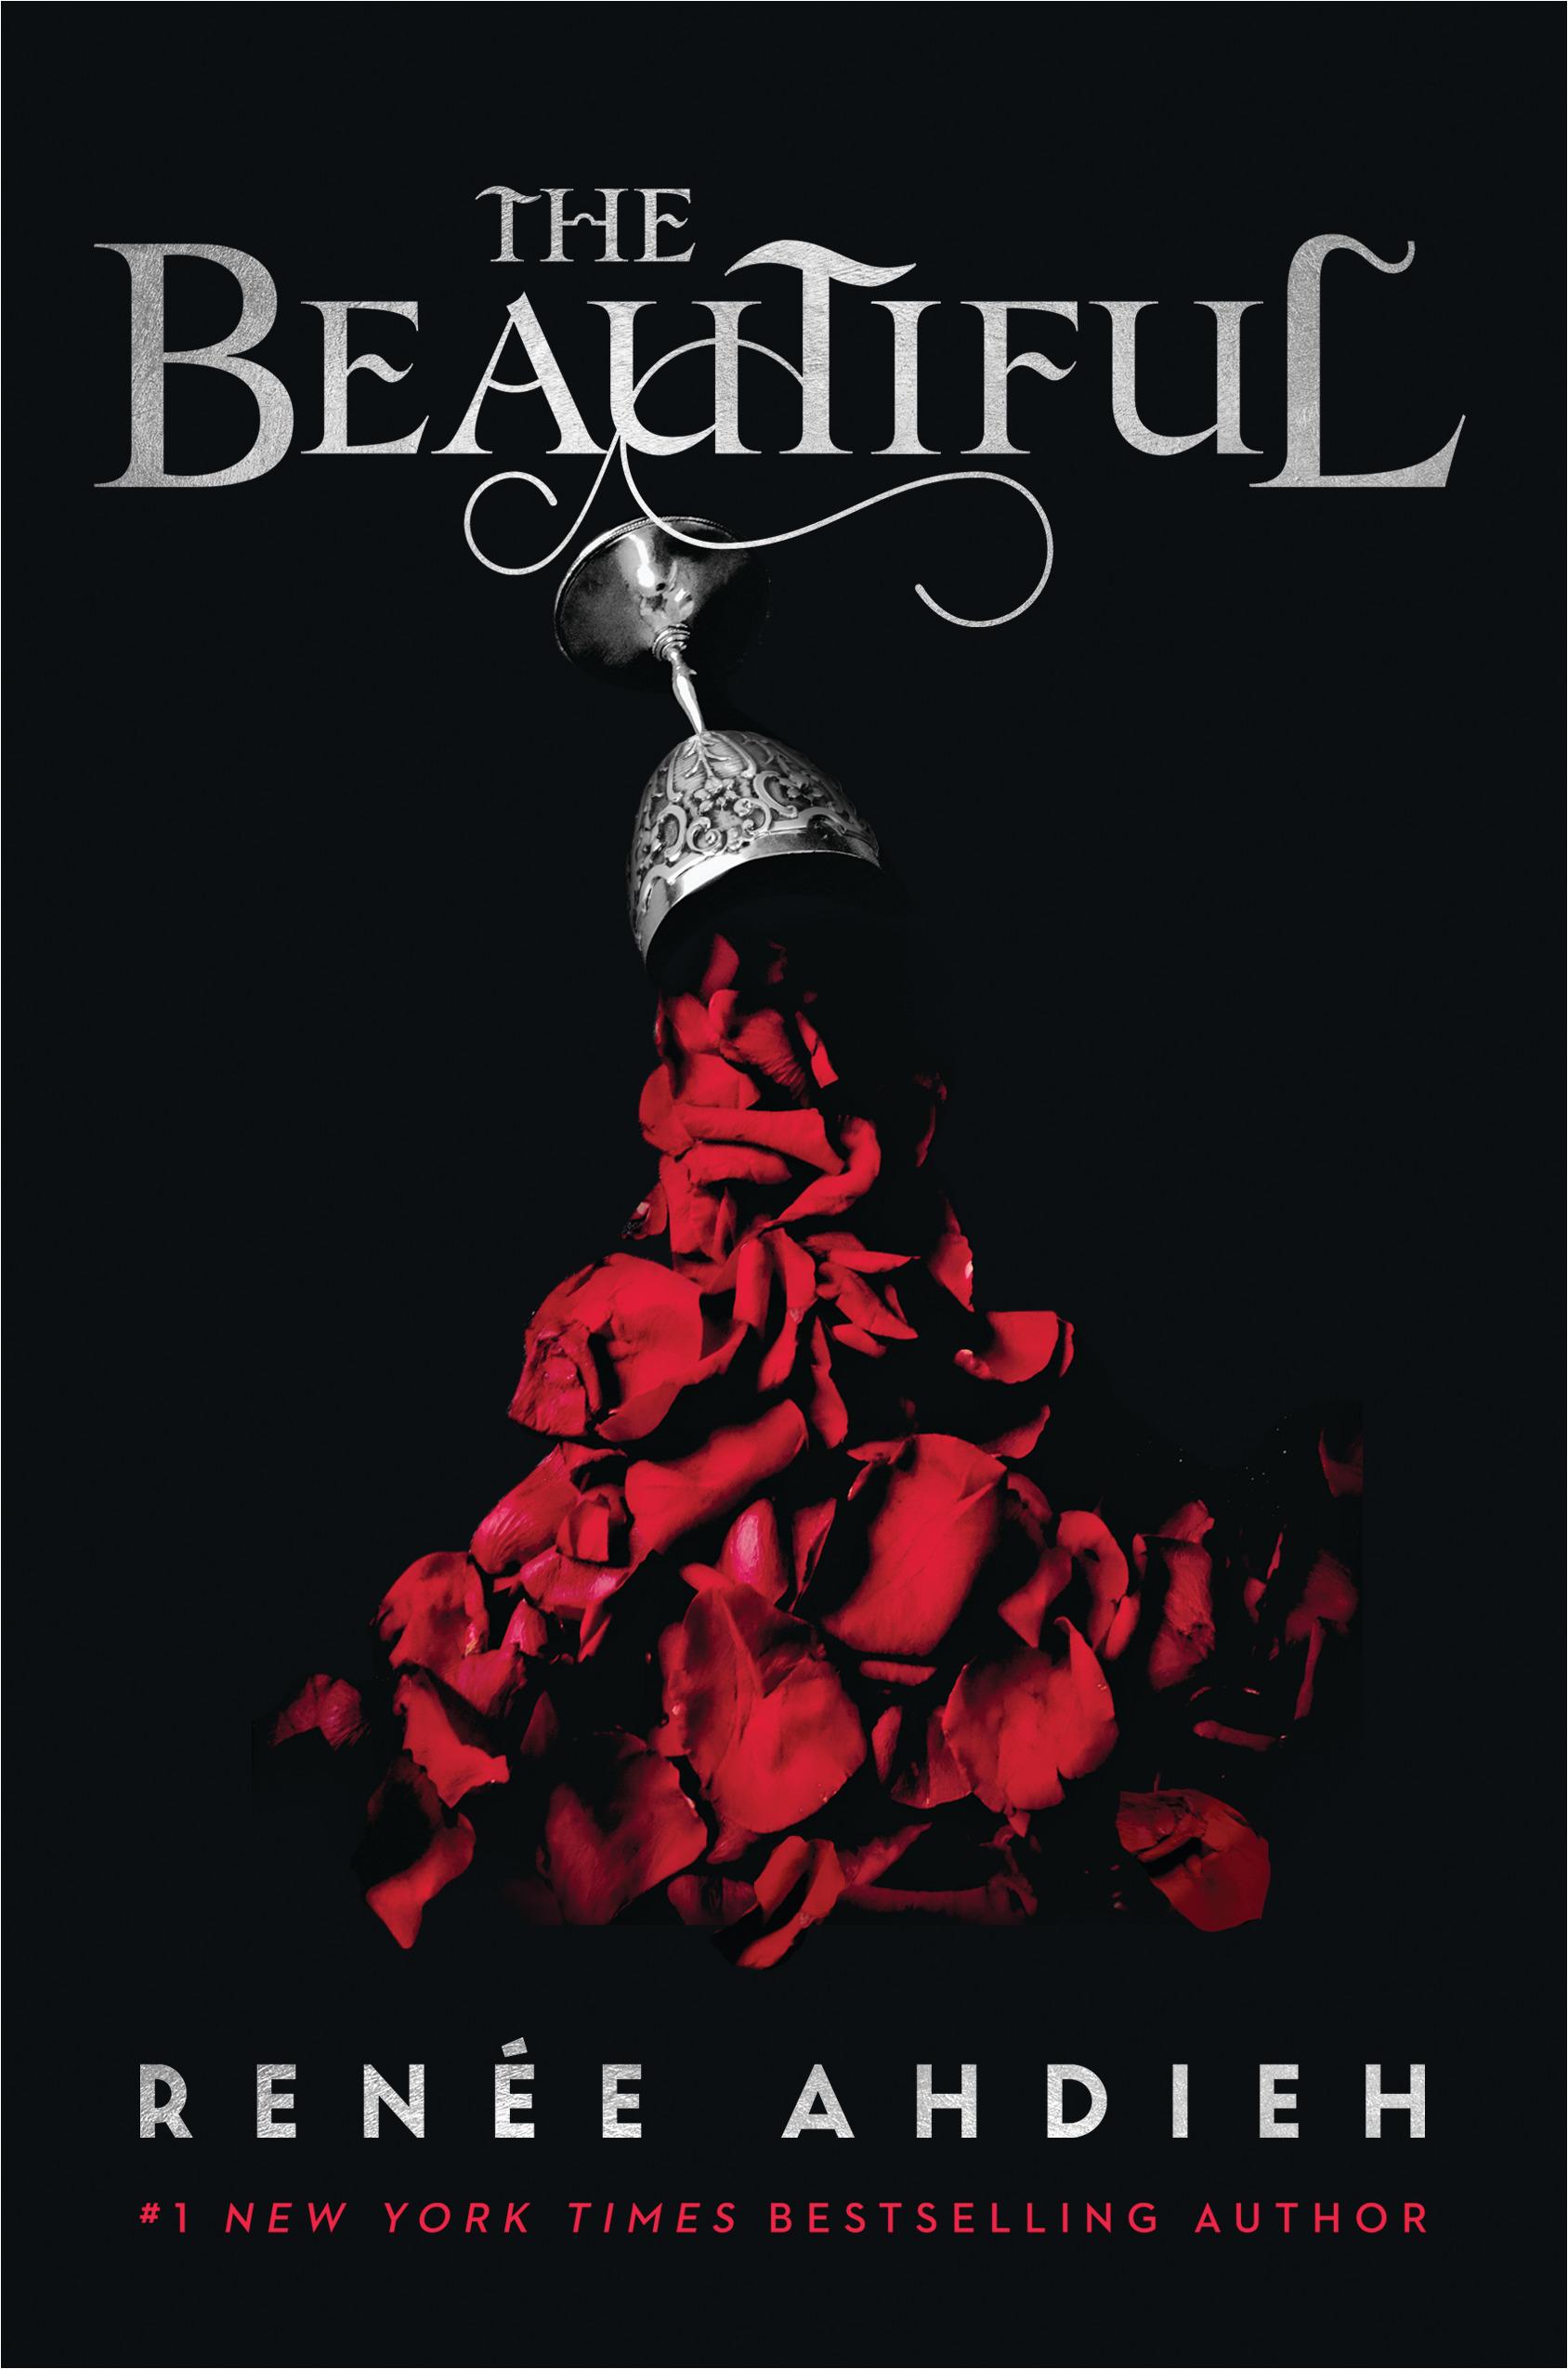 9781524738174_The Beautiful_Final Cover.jpg